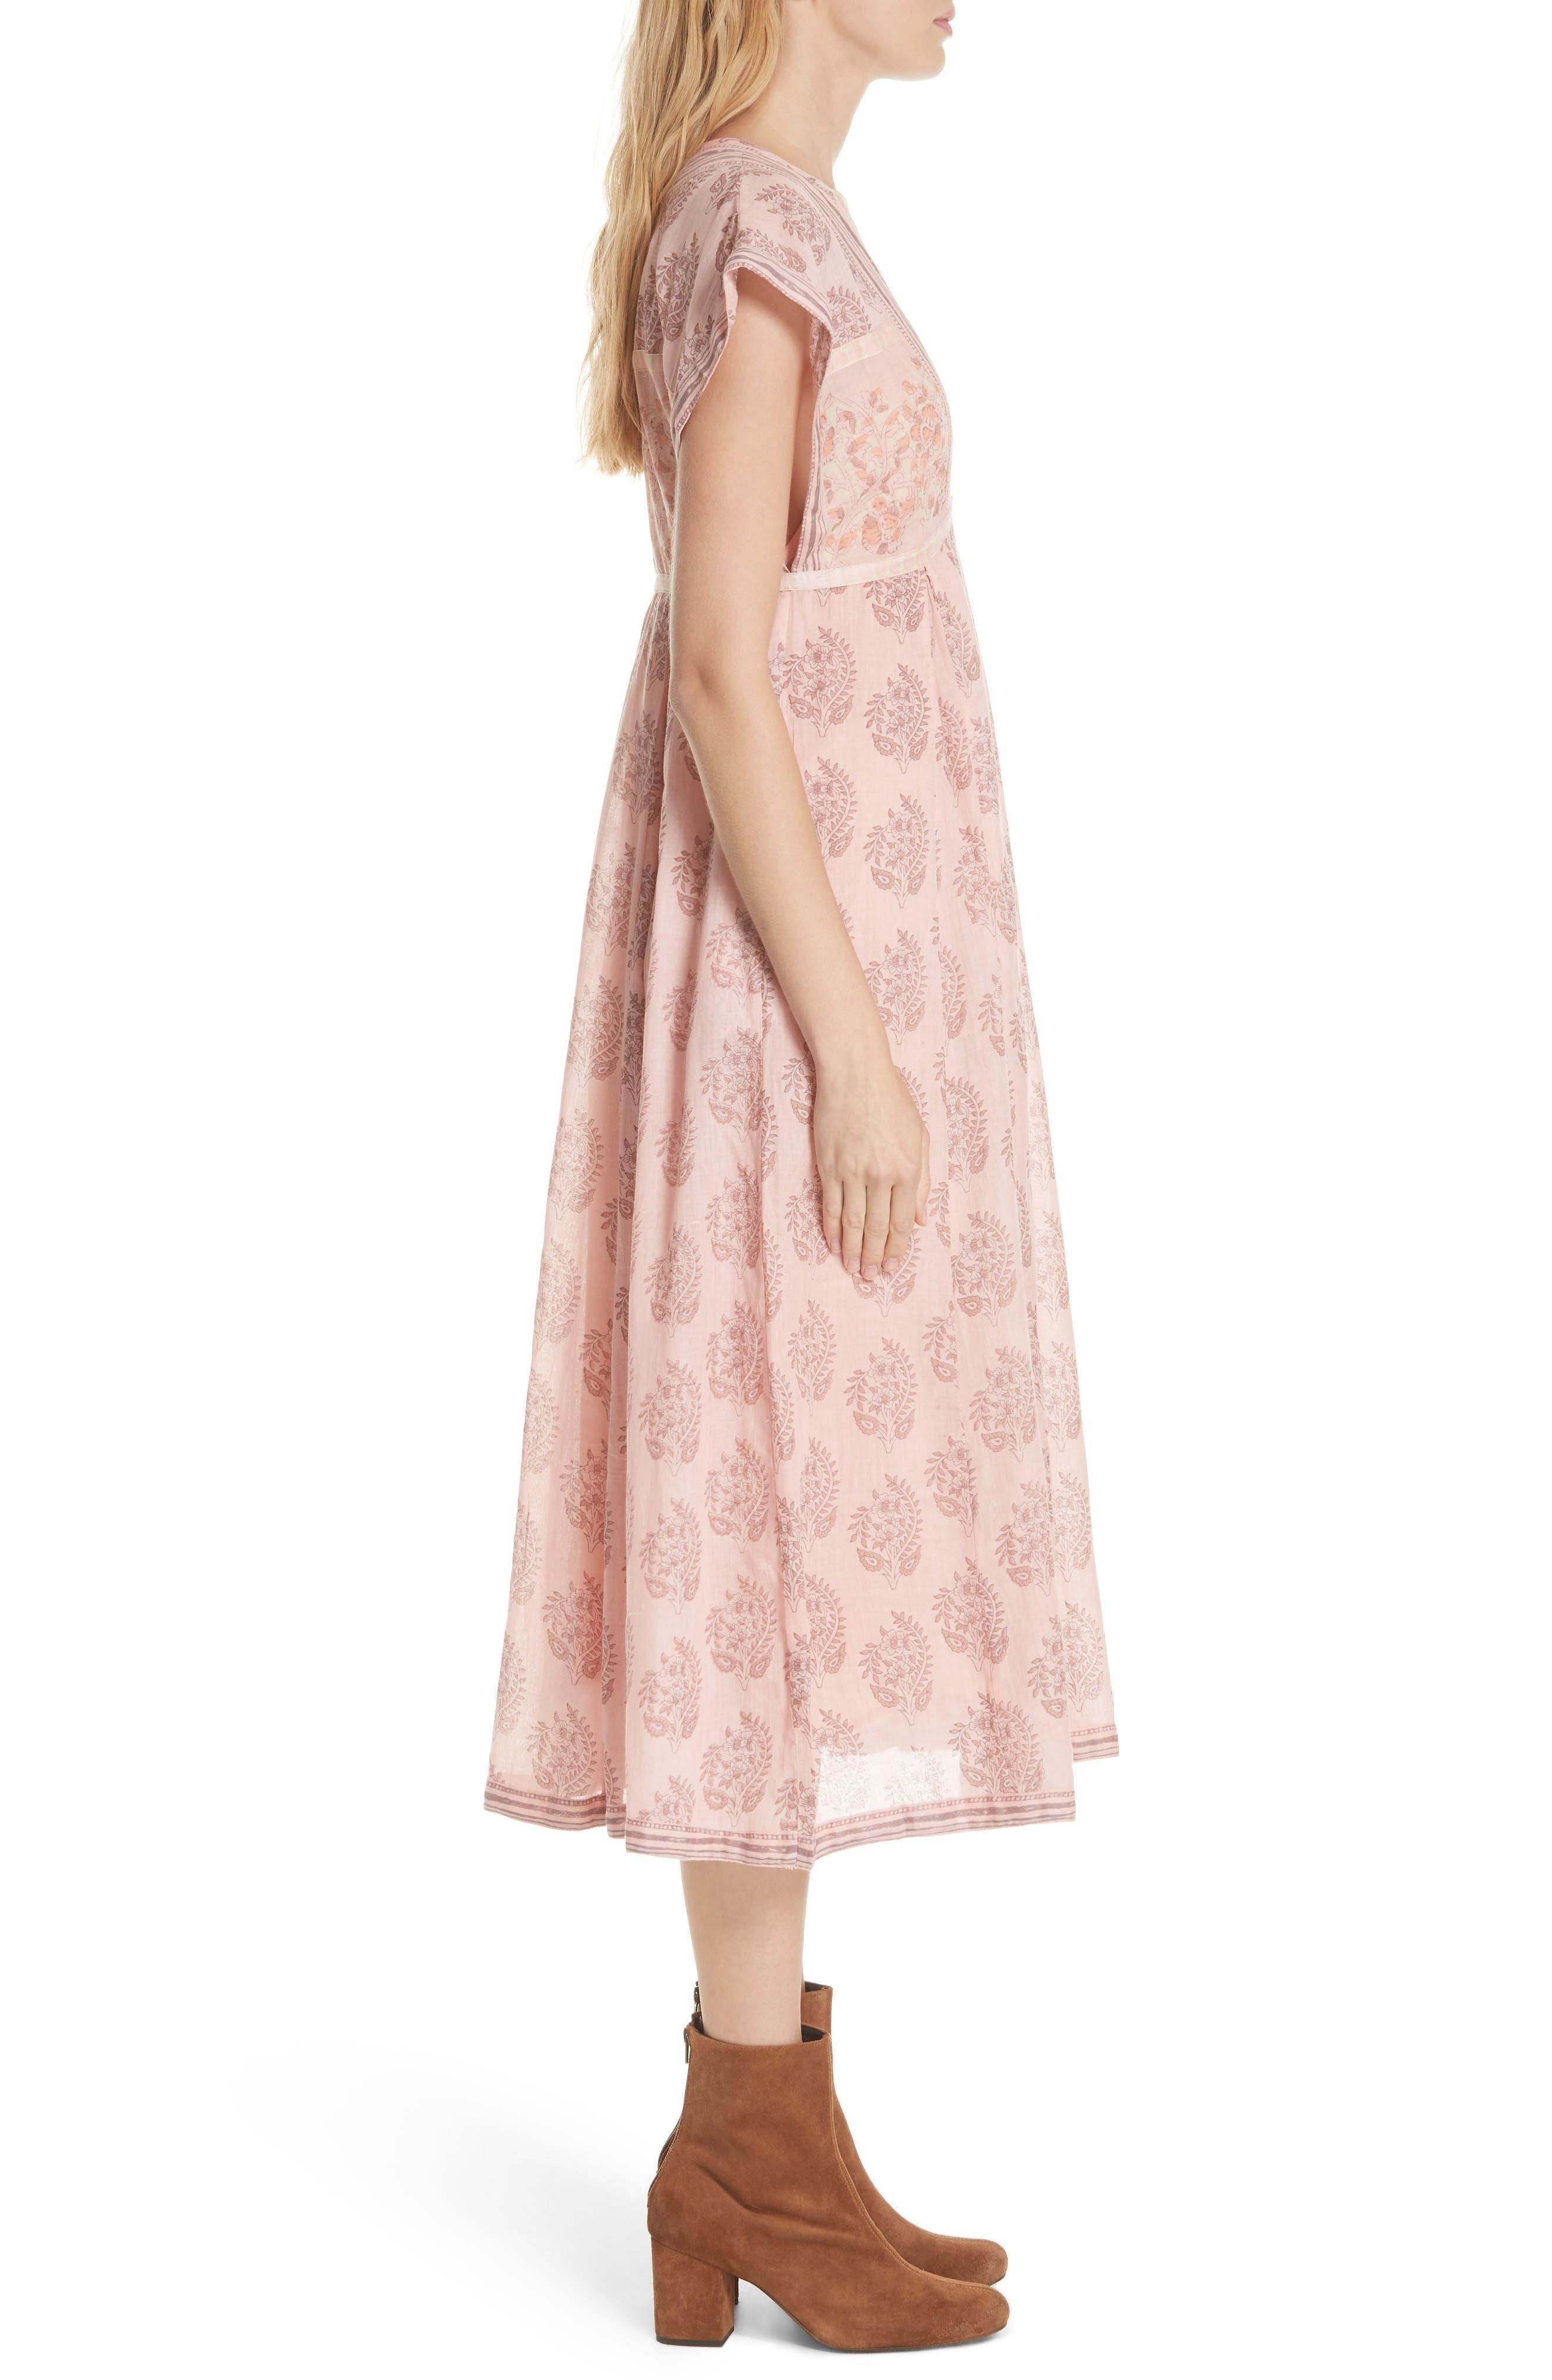 Riakaa Dress,                             Alternate thumbnail 3, color,                             Pink